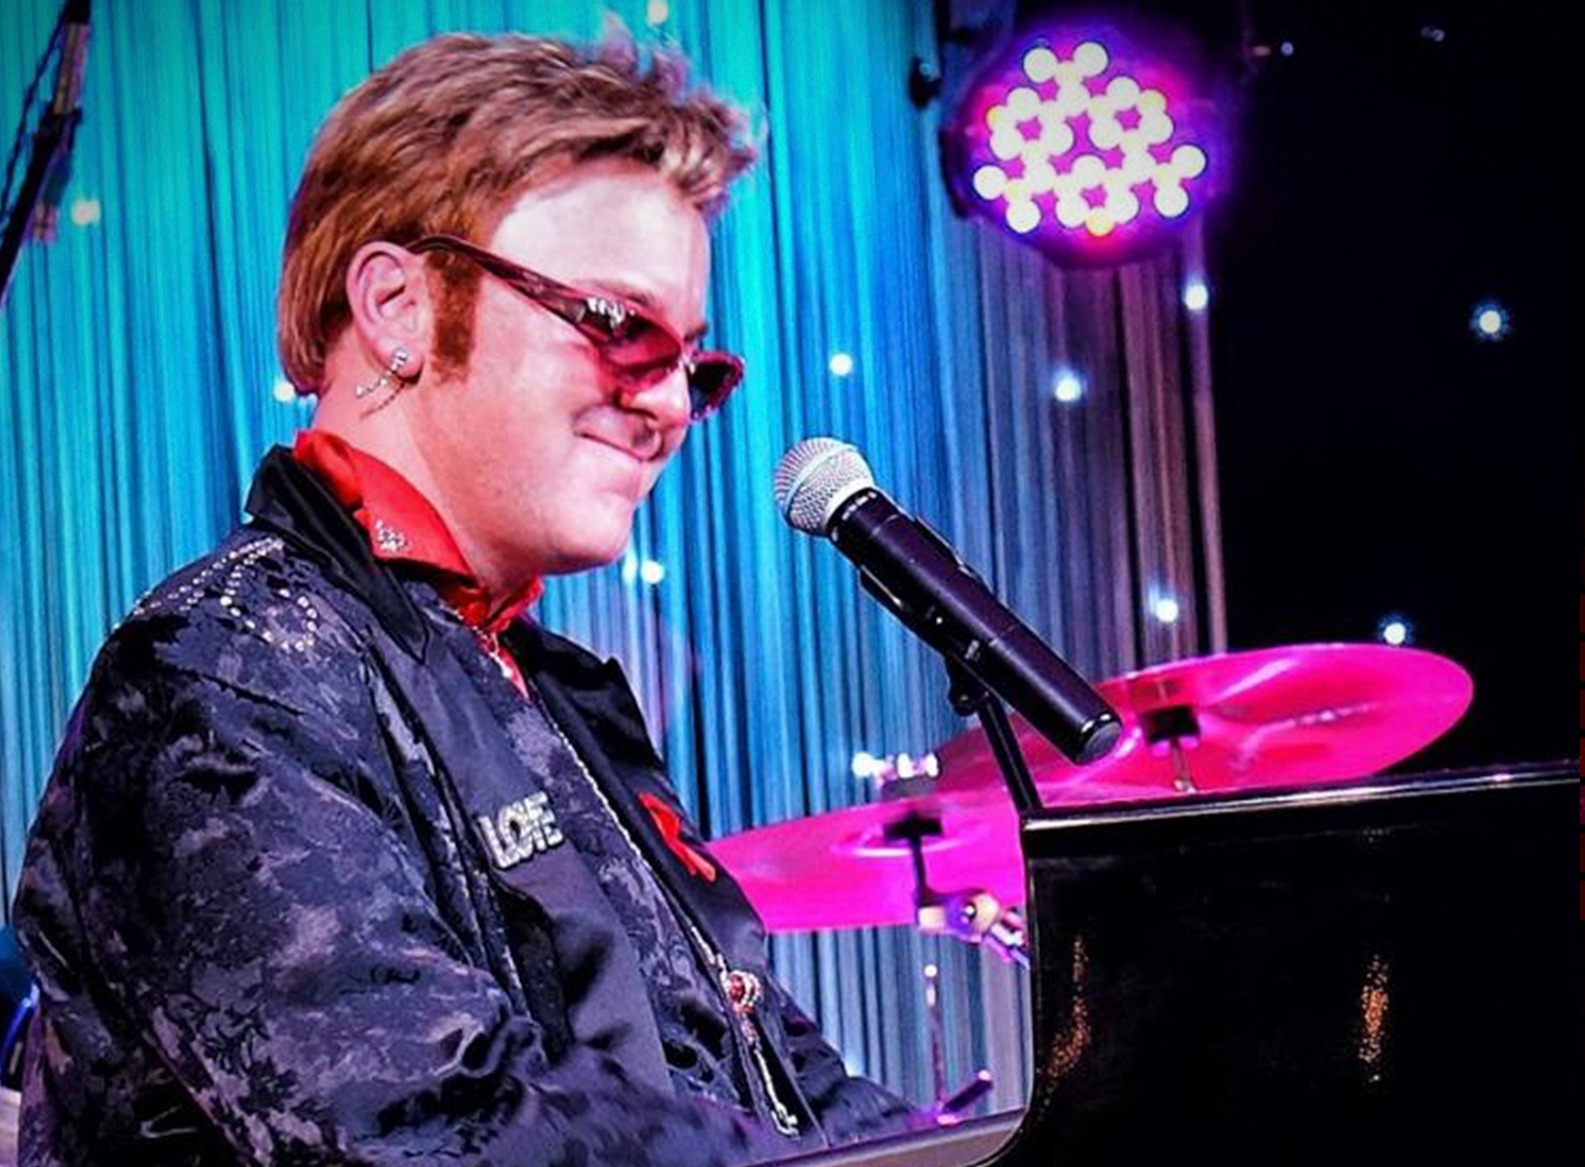 Jimmy Love as Elton John_edited_edited